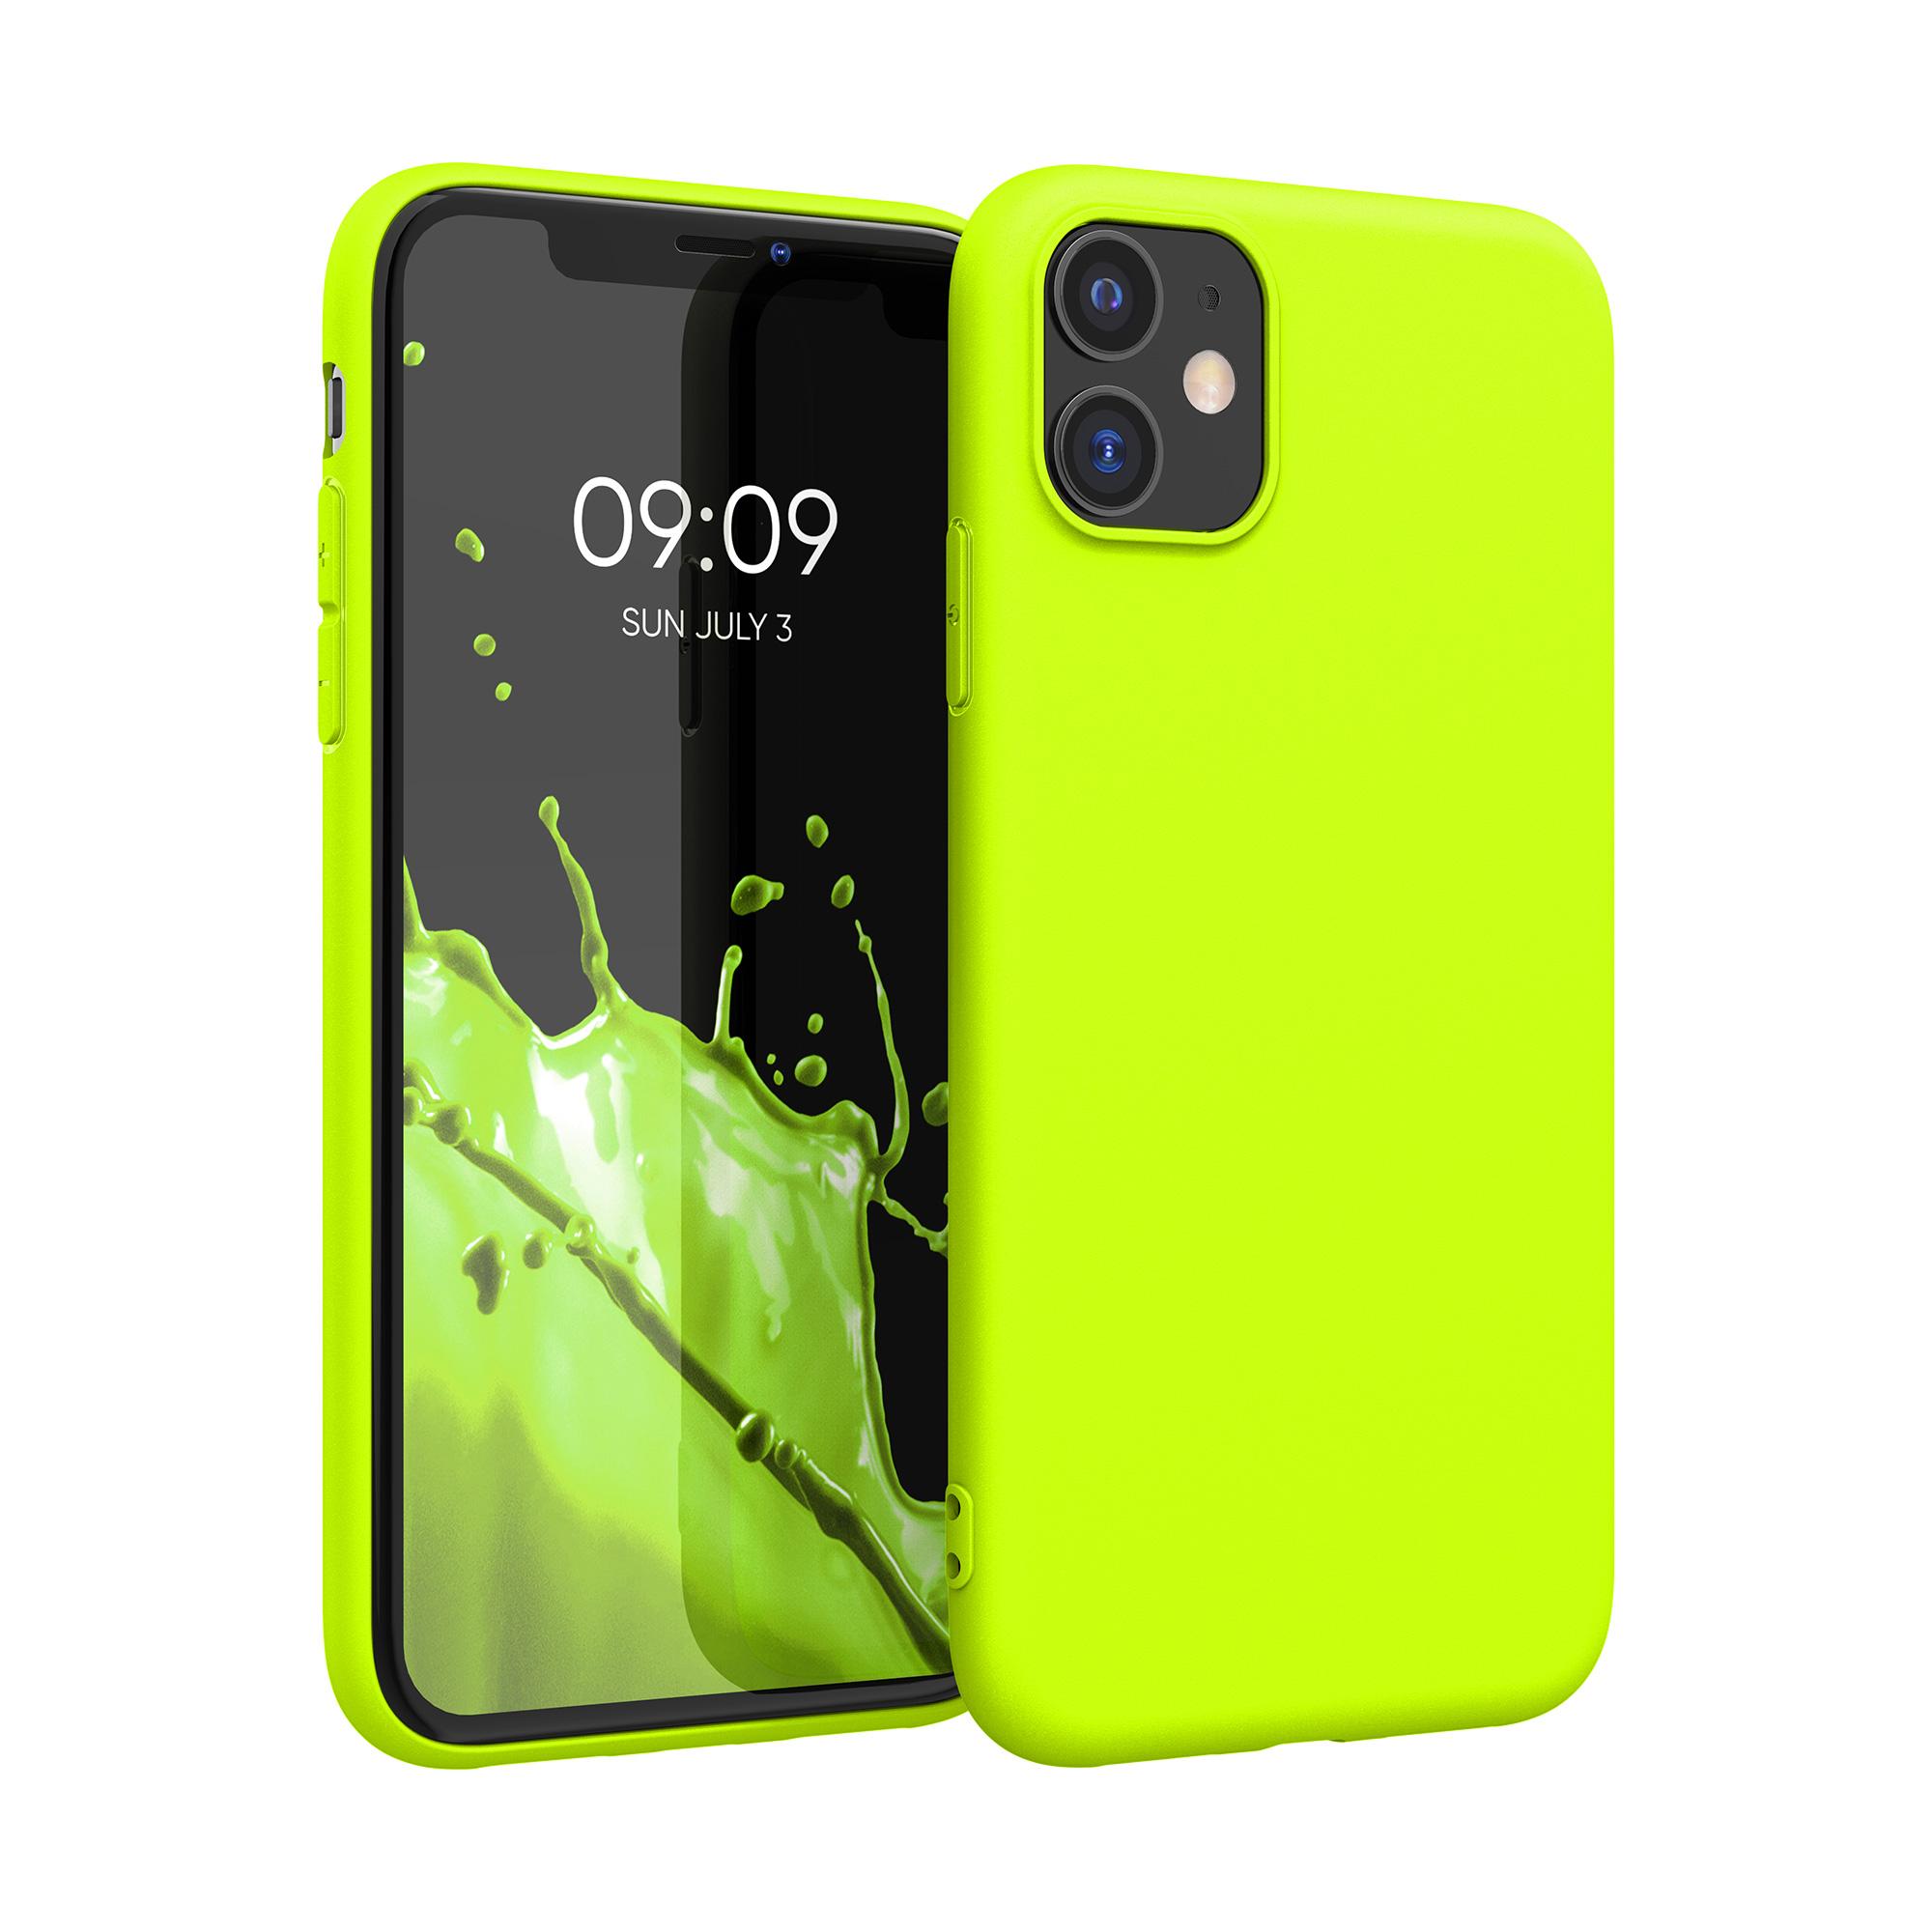 Kvalitní silikonové TPU pouzdro pro Apple iPhone 11 - Neon Yellow